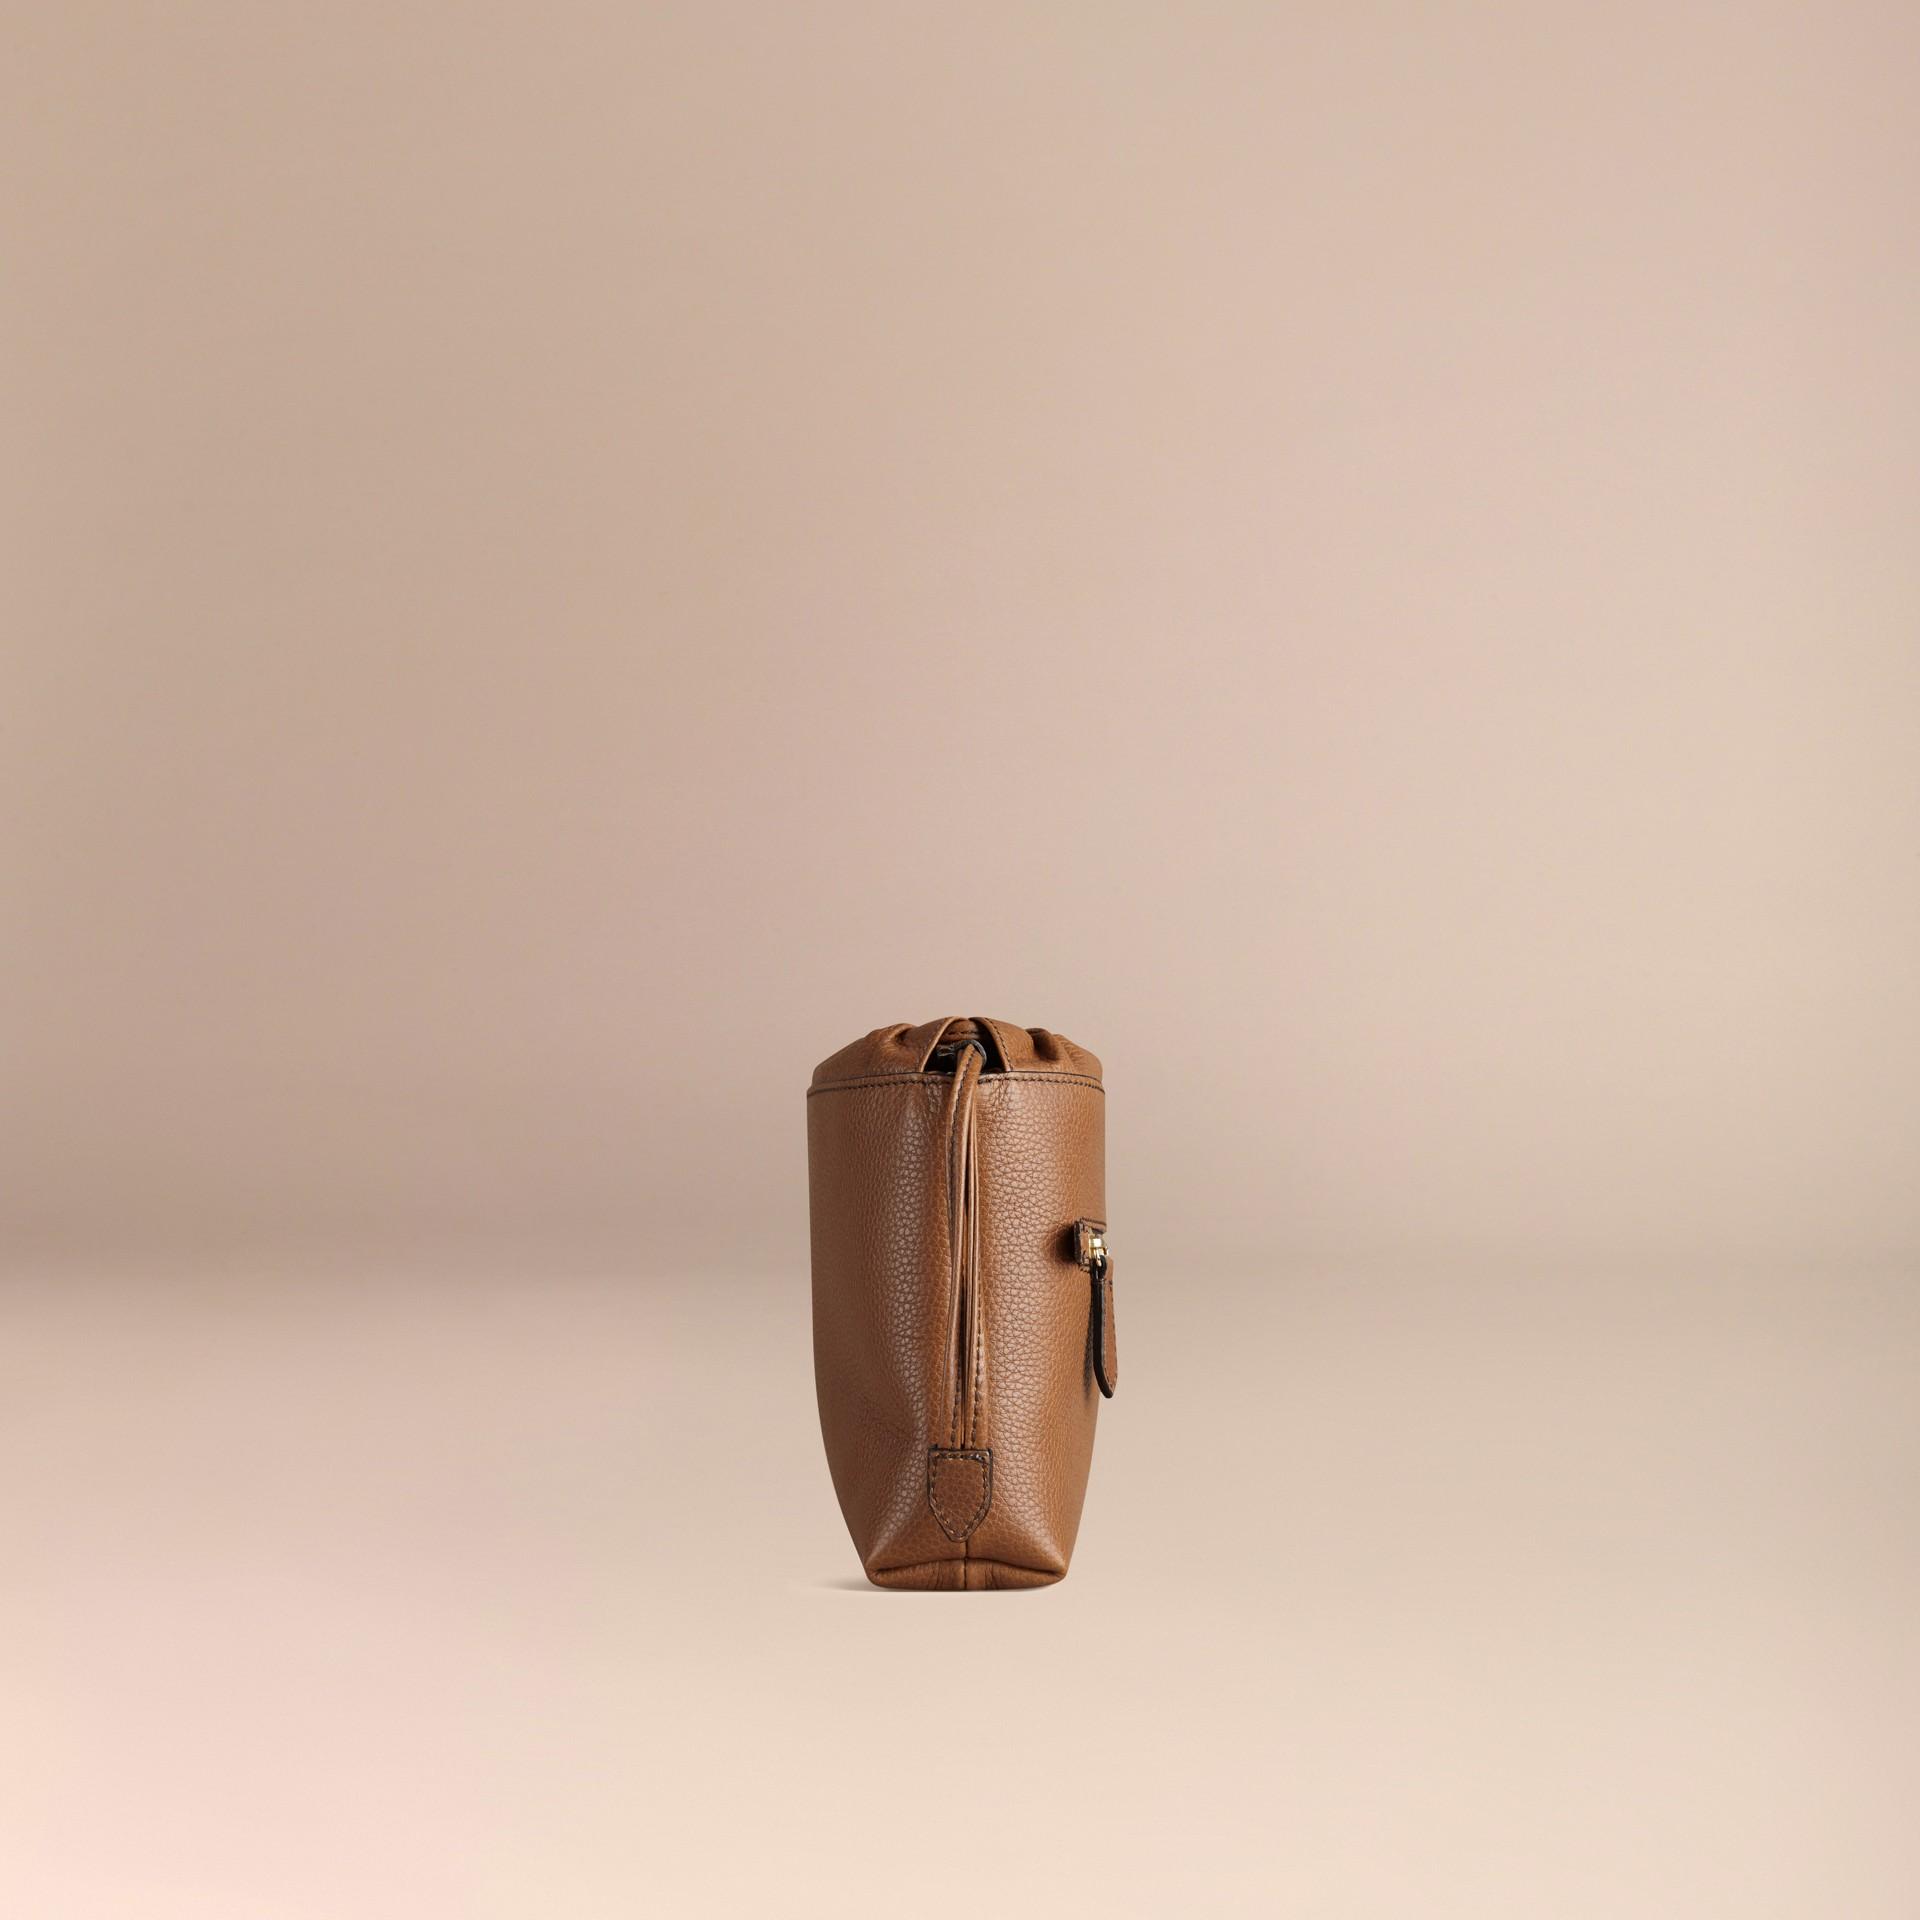 Hâle Sac The Mini Crush en cuir grené Hâle - photo de la galerie 3